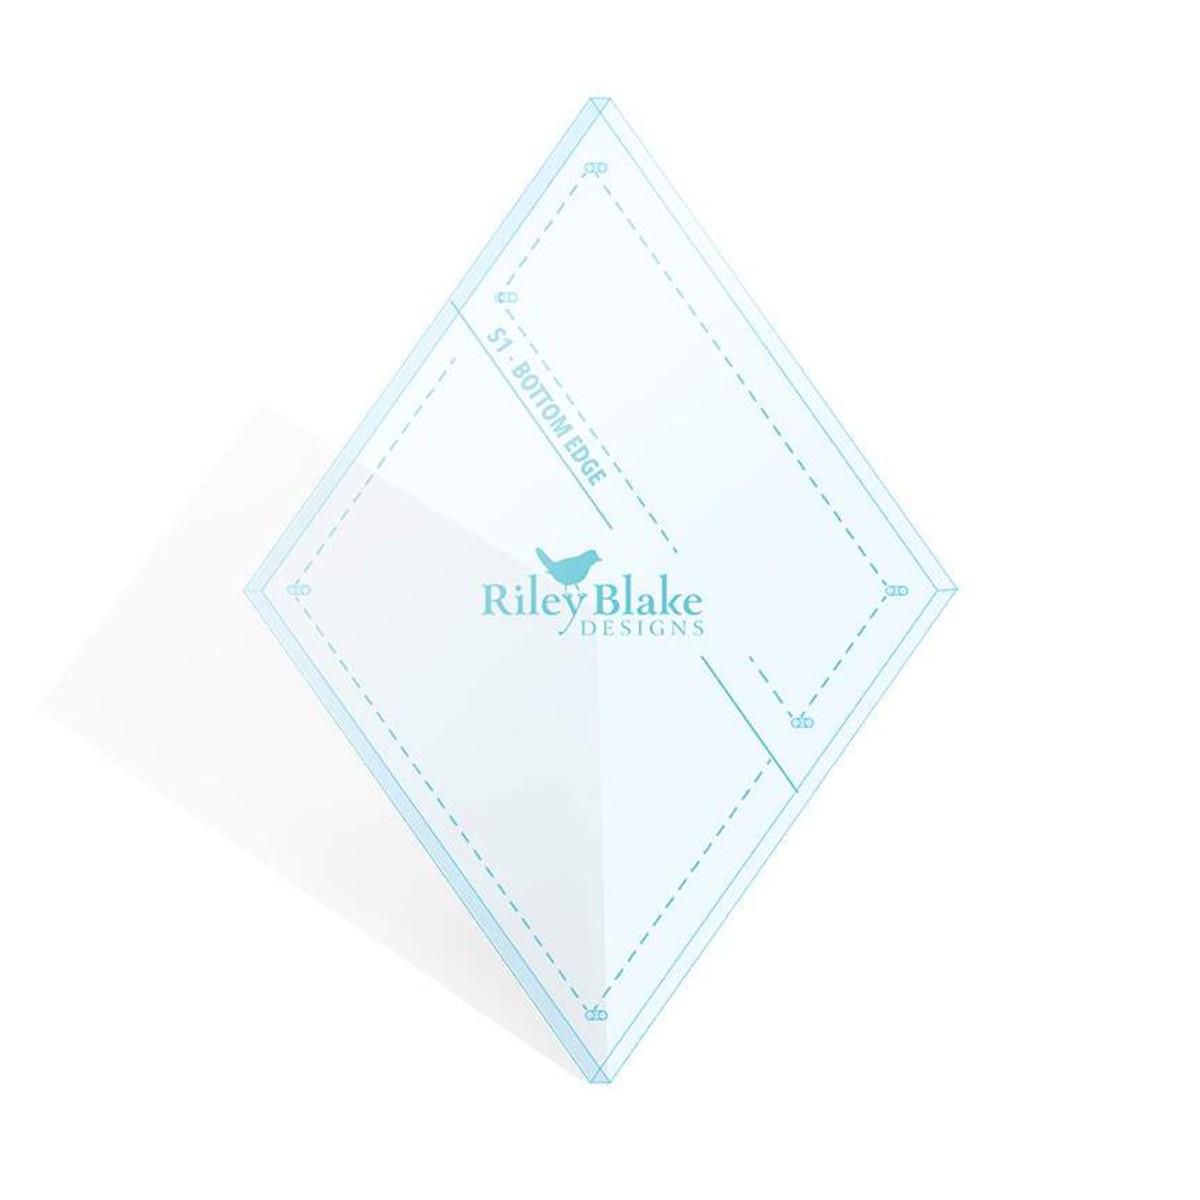 Riley Blake Jane Austen Acrylic Template